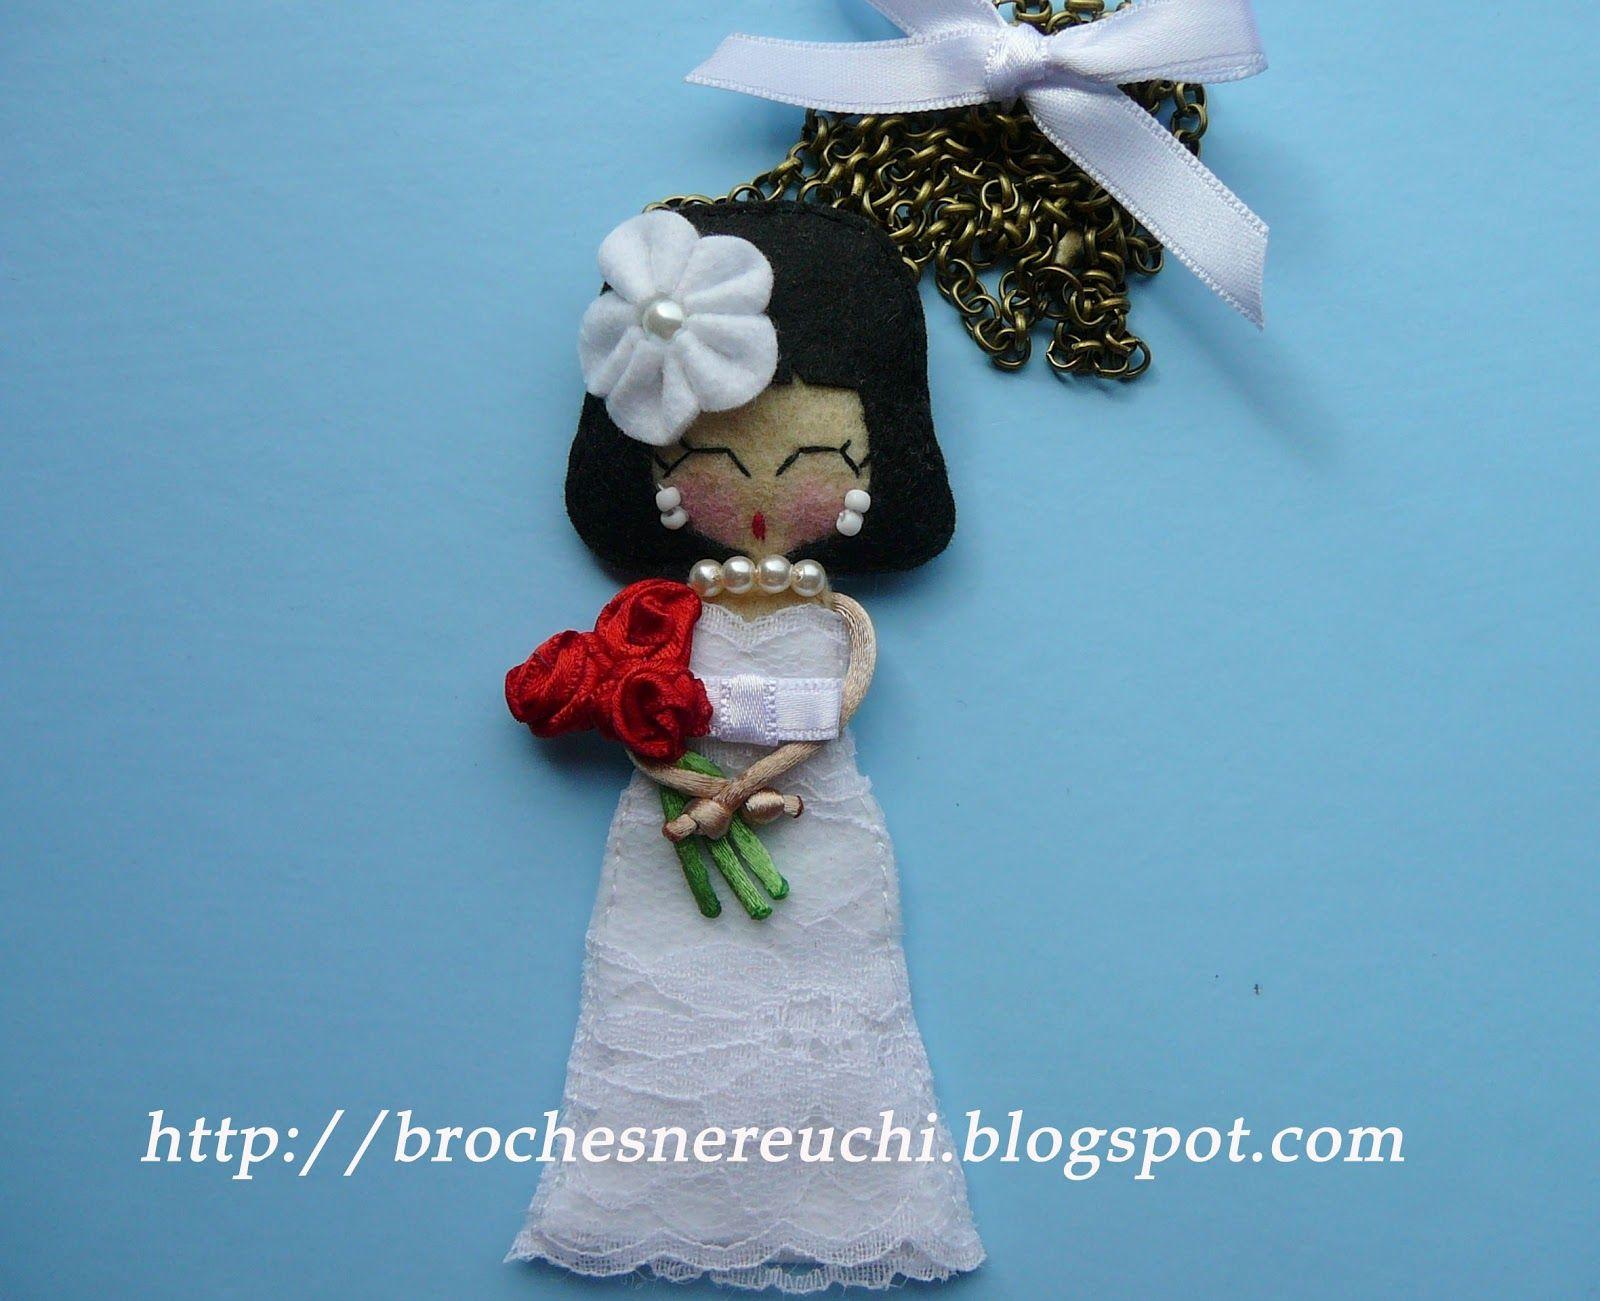 BROCHES NEREUCHI: BROCHE NOVIA PERSONALIZADO | куклы из фетра ...